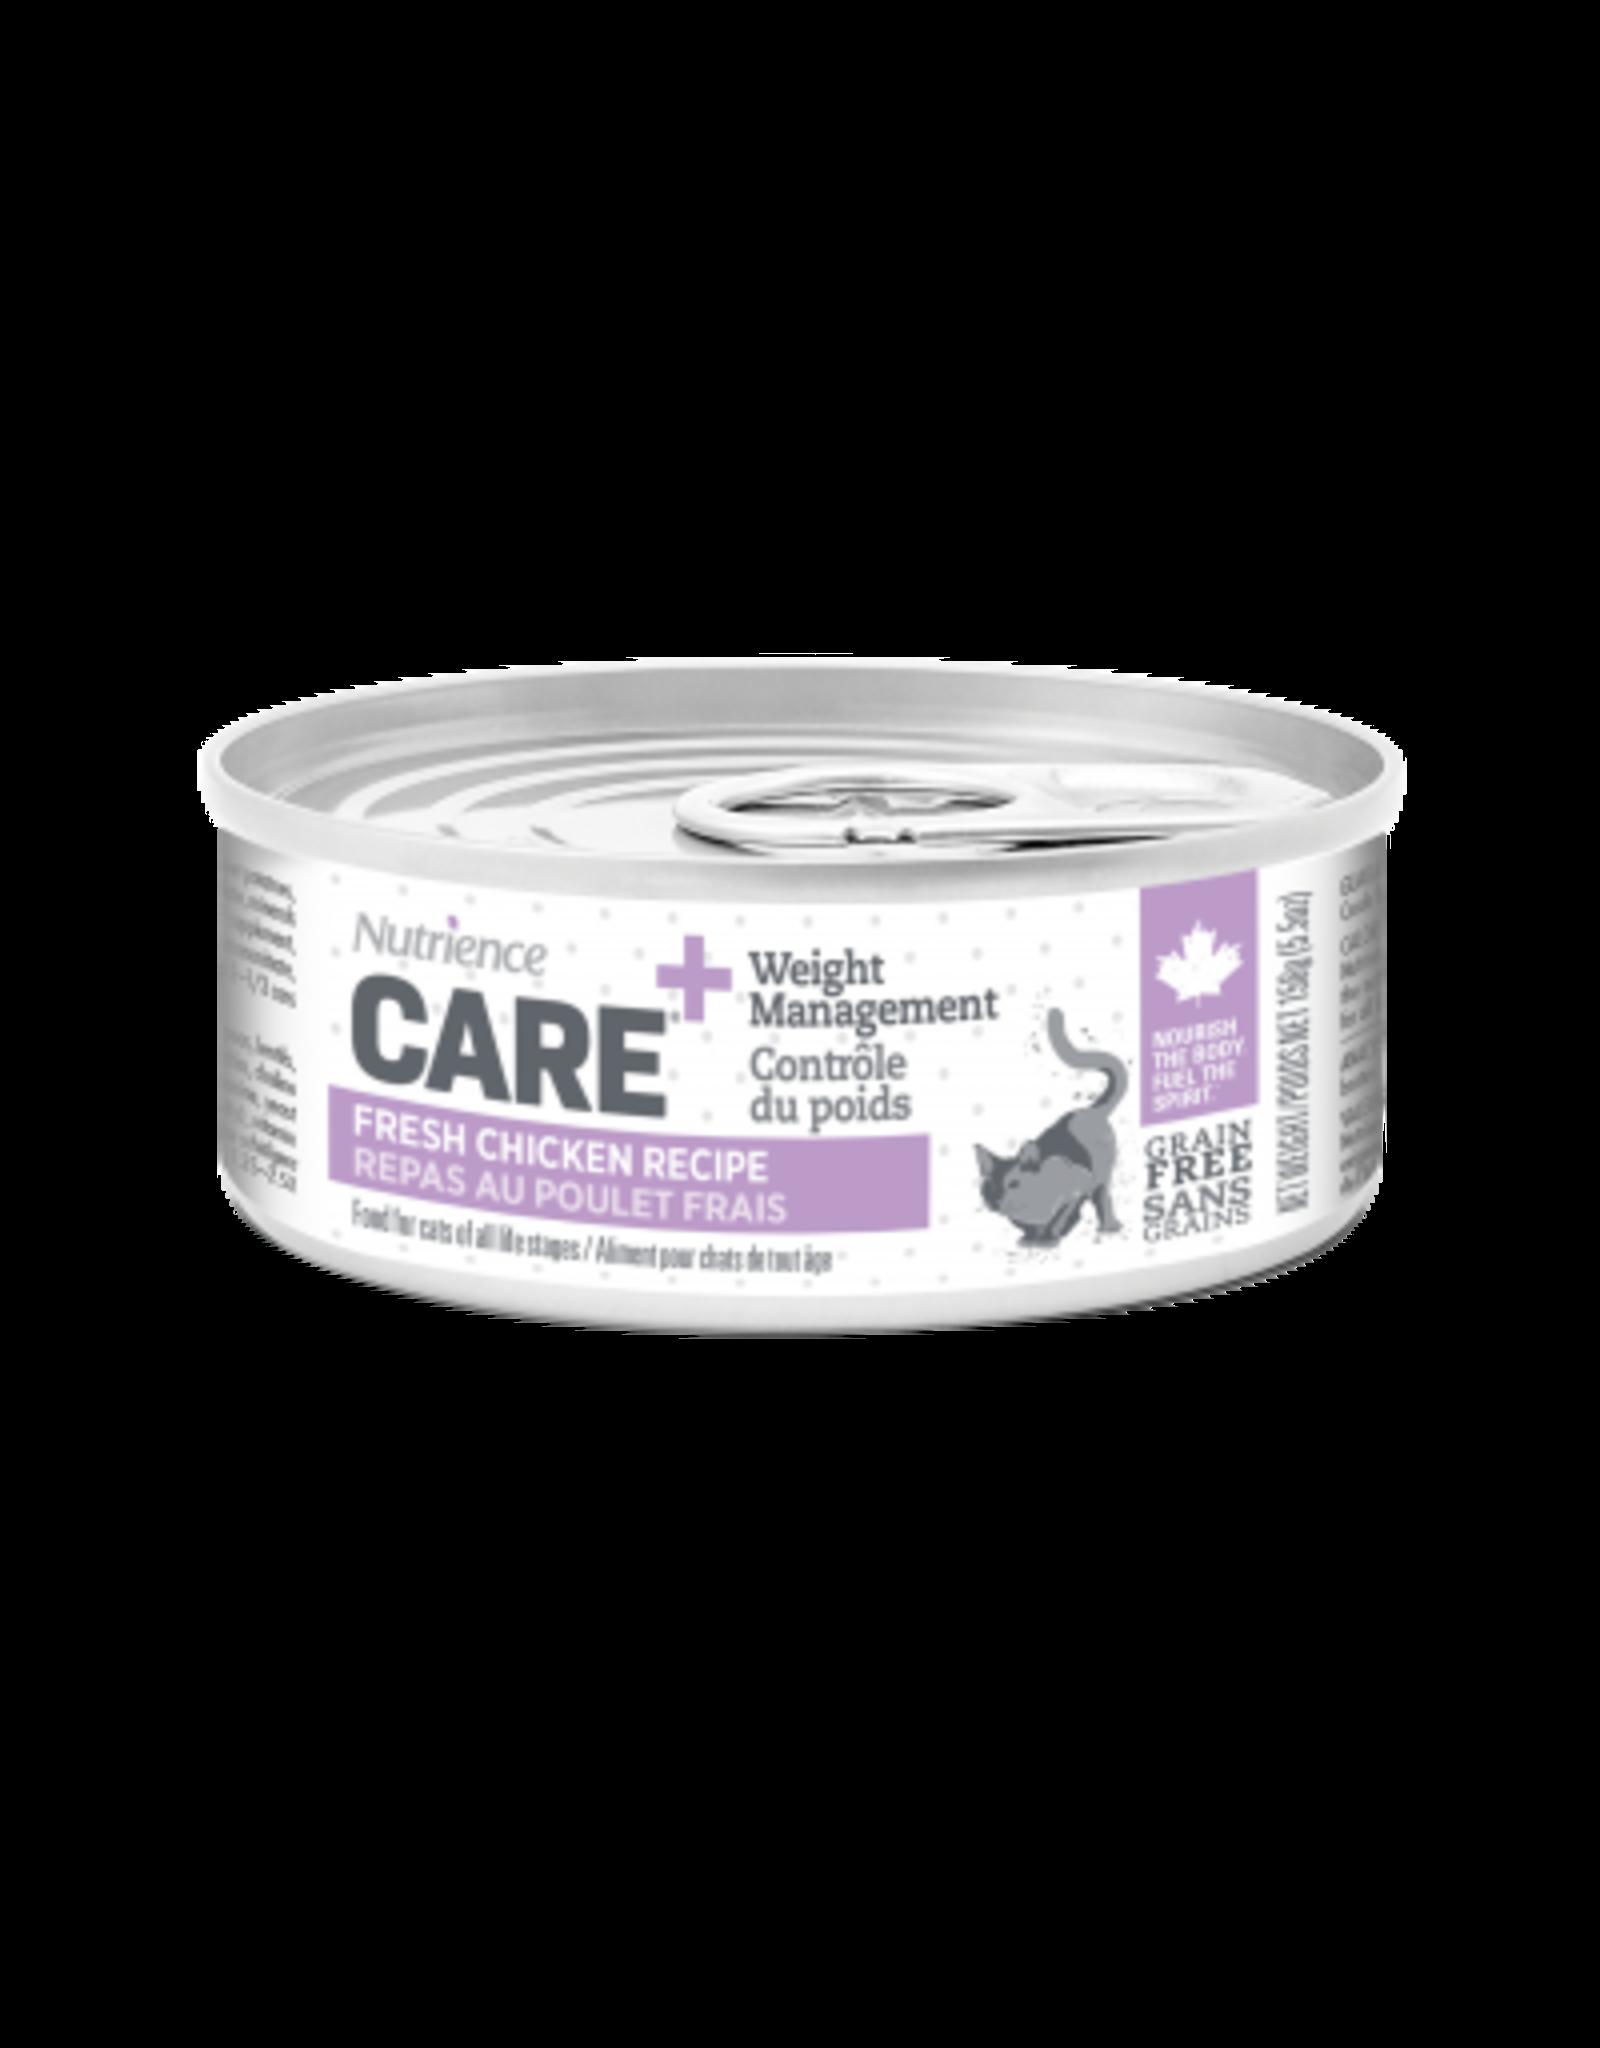 Nutrivet Nutrience Care+ Cat Weight Management 5.5oz